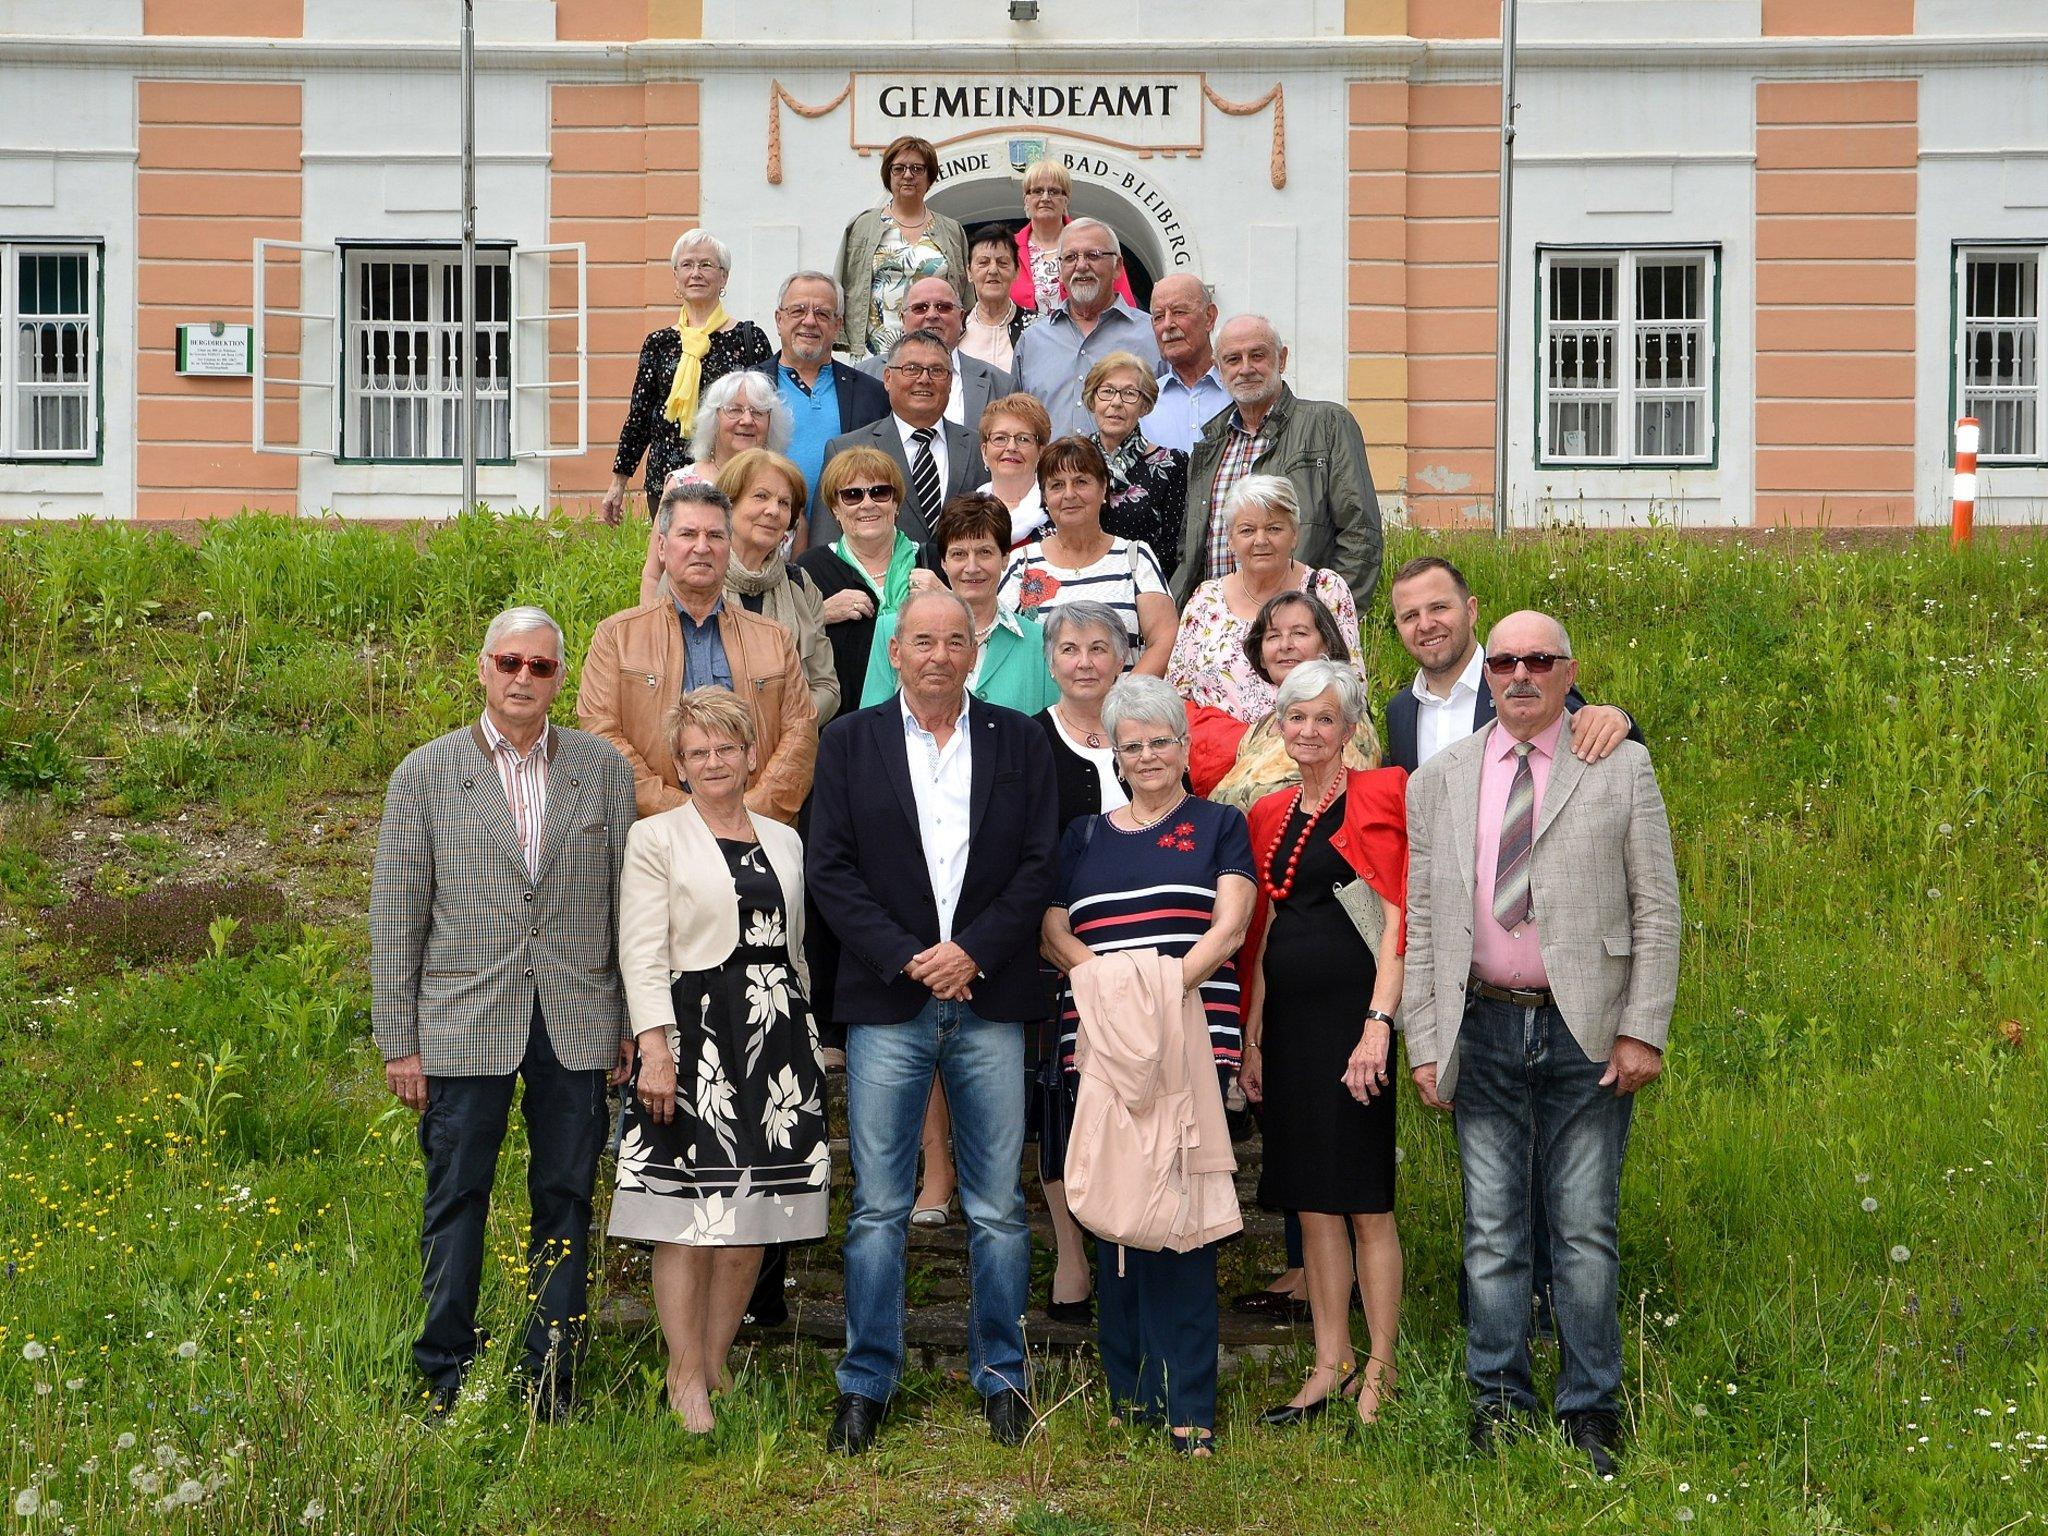 Bad Bleiberg: Bad Bleiberger 49-er-Treffen - Villach Land